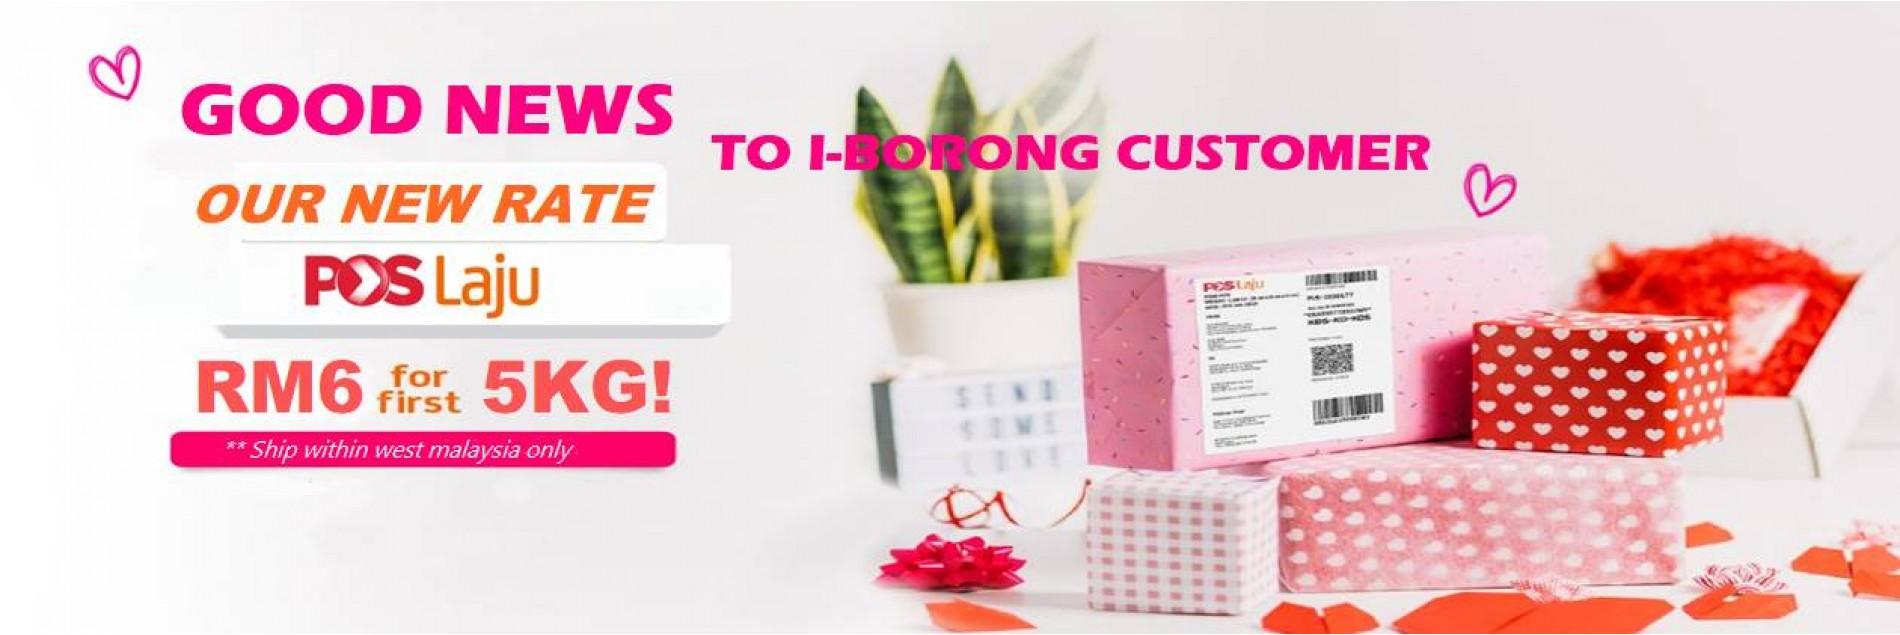 I-BORONG.MY - DROPSHIP POSLAJU FLAT RATE 5KG RM6 - WELCOME DROPS